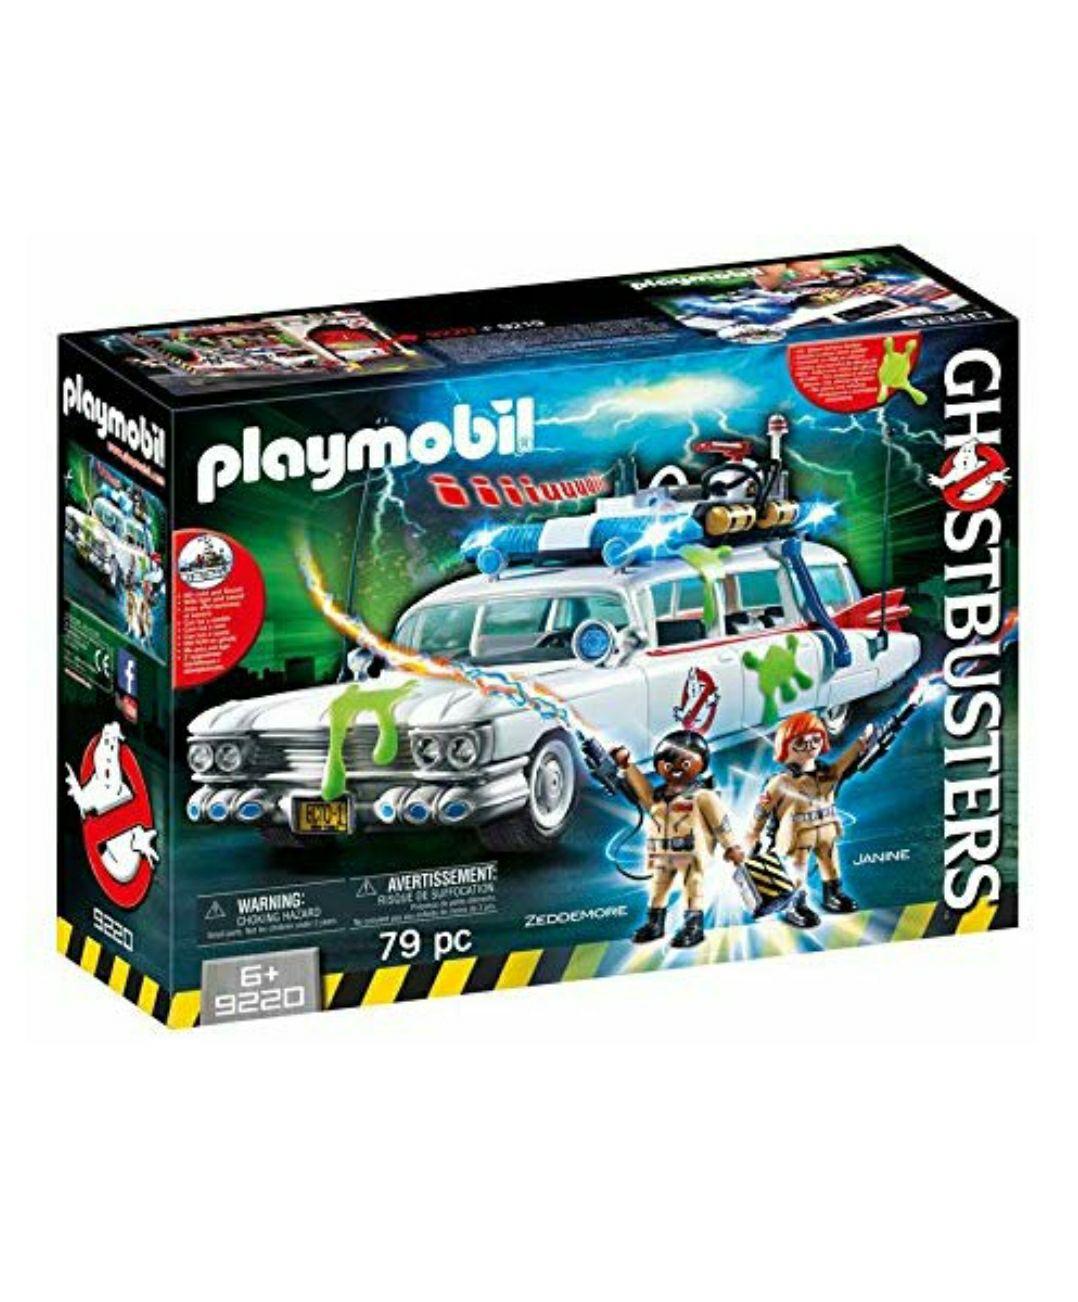 Amazon: Playmobil Ghostbusters: Ecto-1 Cazafantasmas